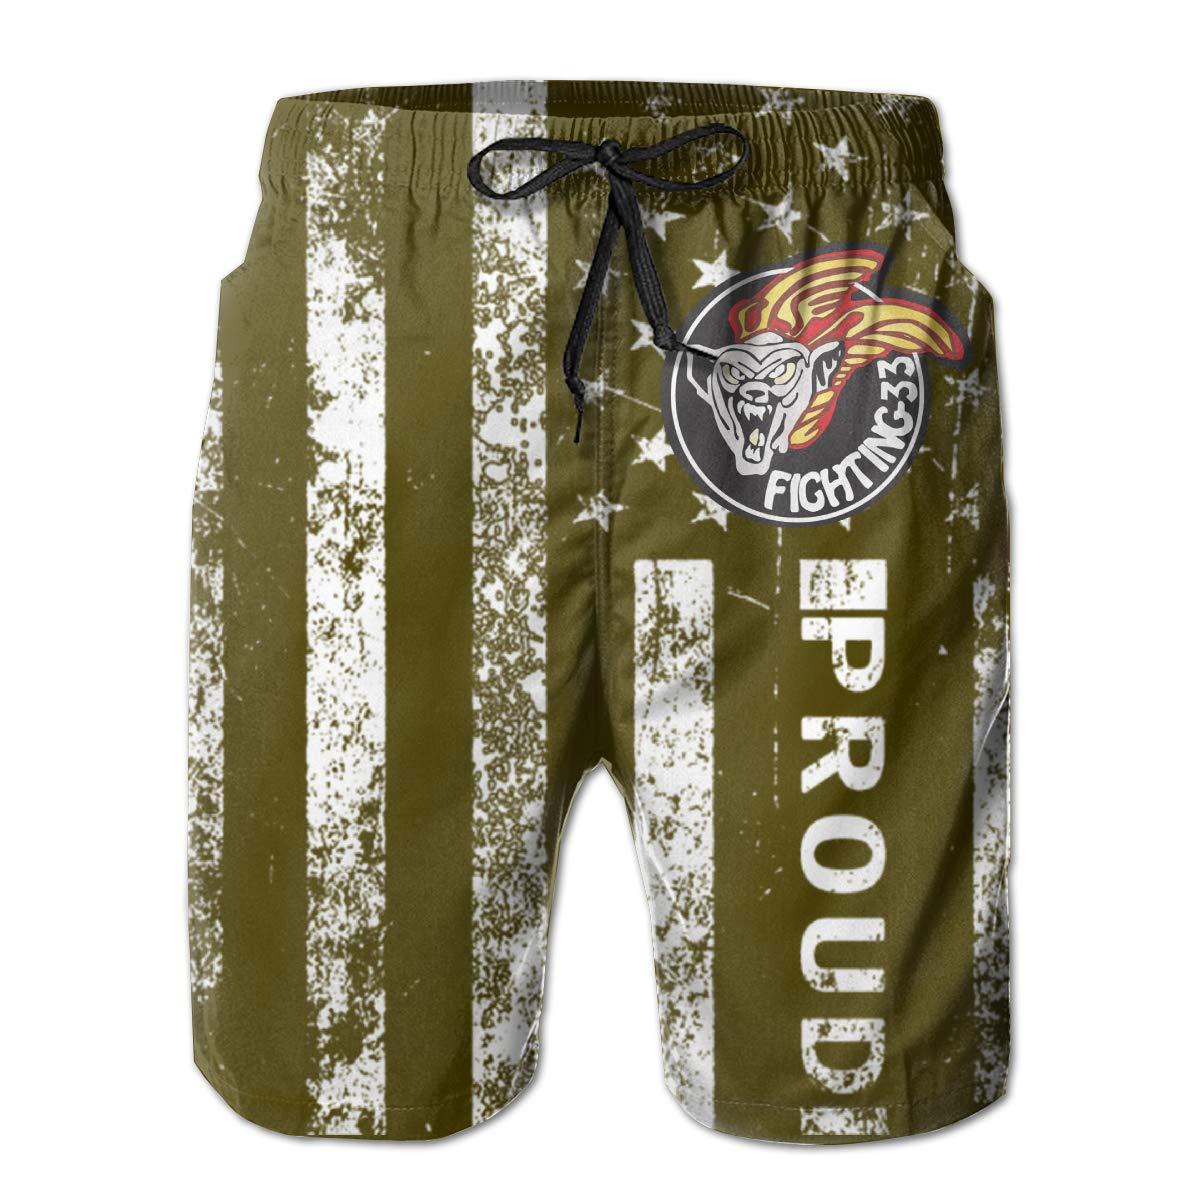 HANINPZ American Proud VF-33 Fighting 33 Mens Swim Trunks Beach Short Board Shorts